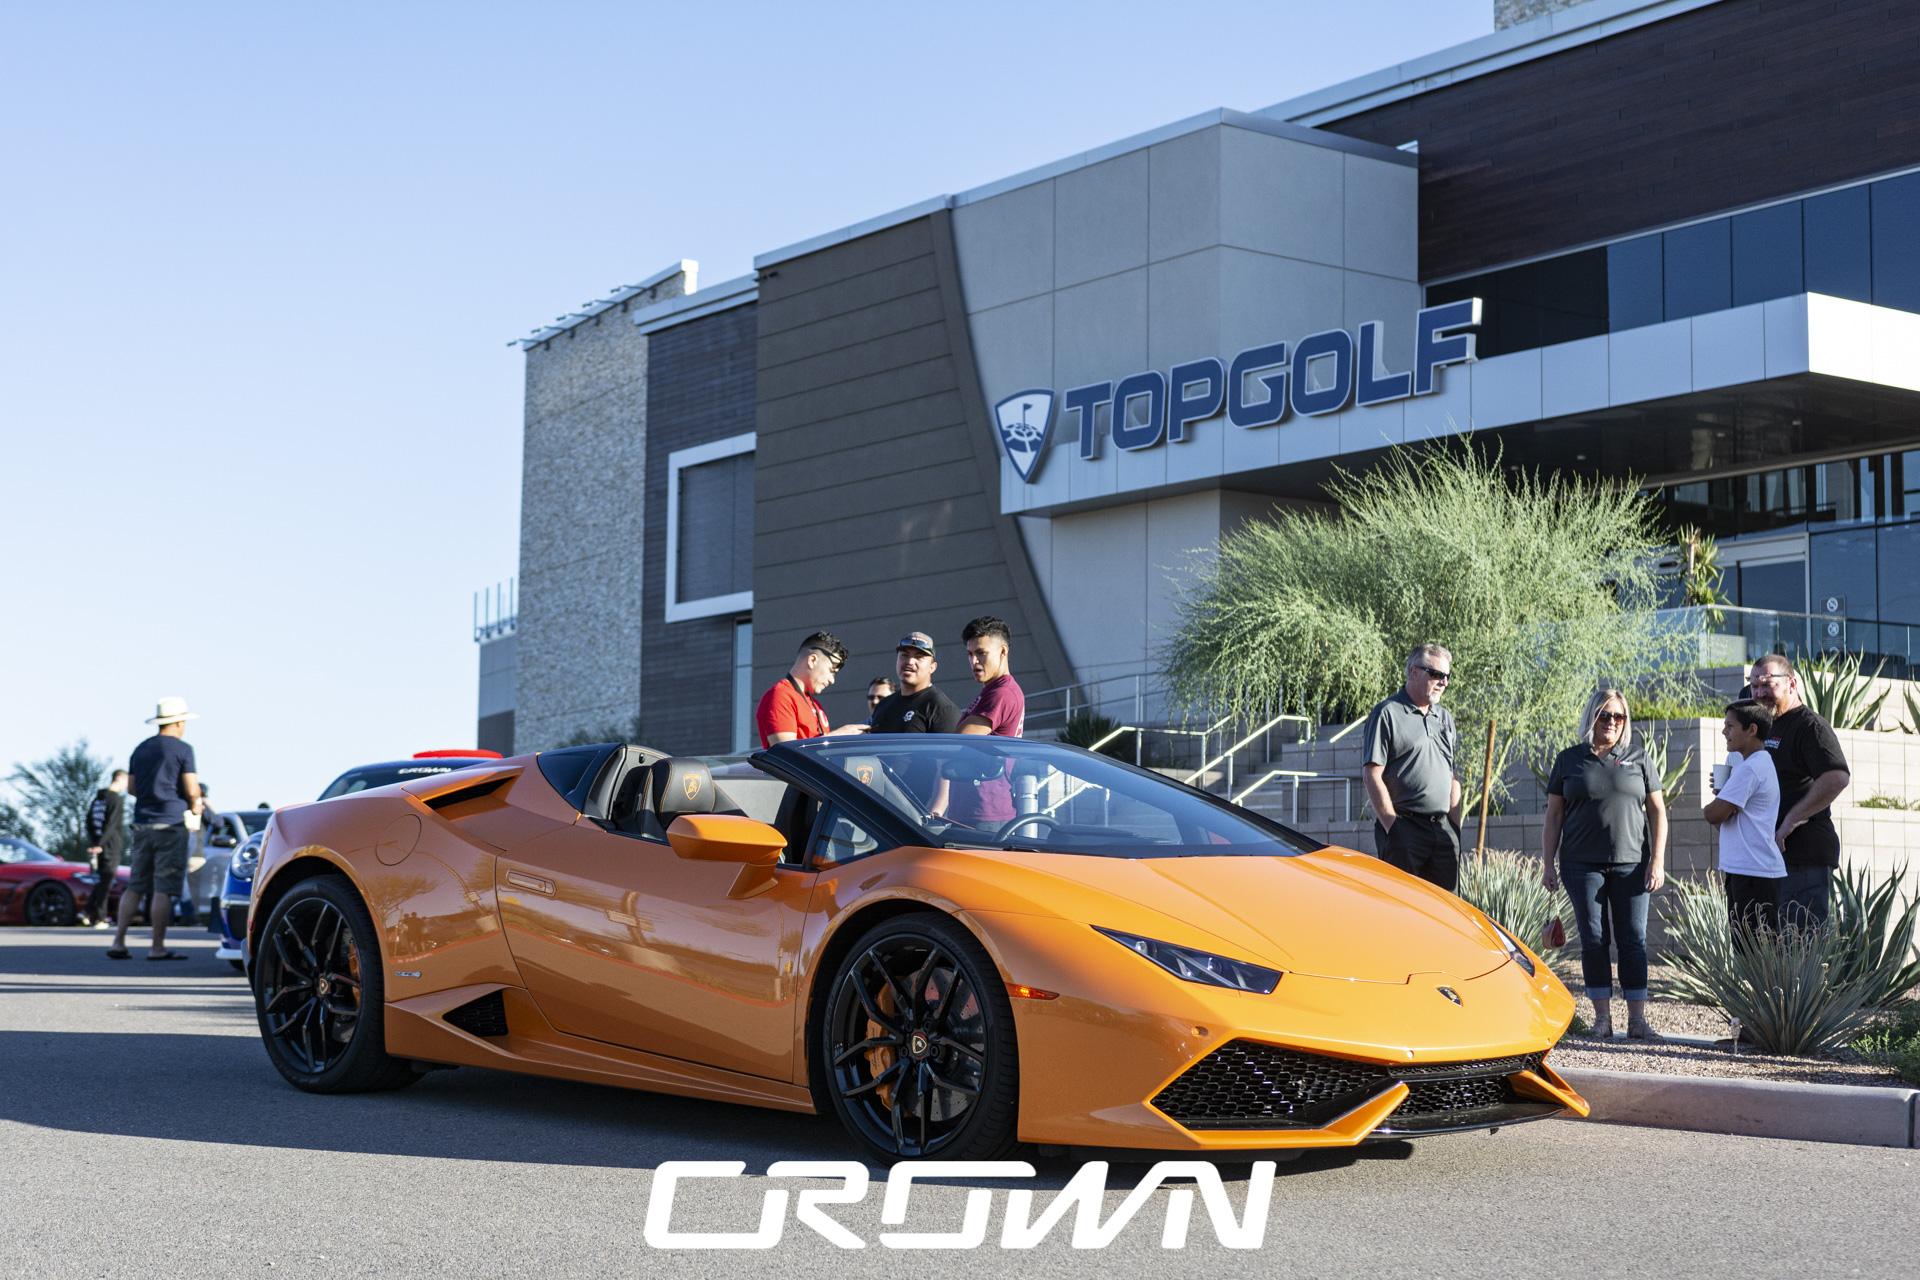 orange Lambo at TopGolf car show